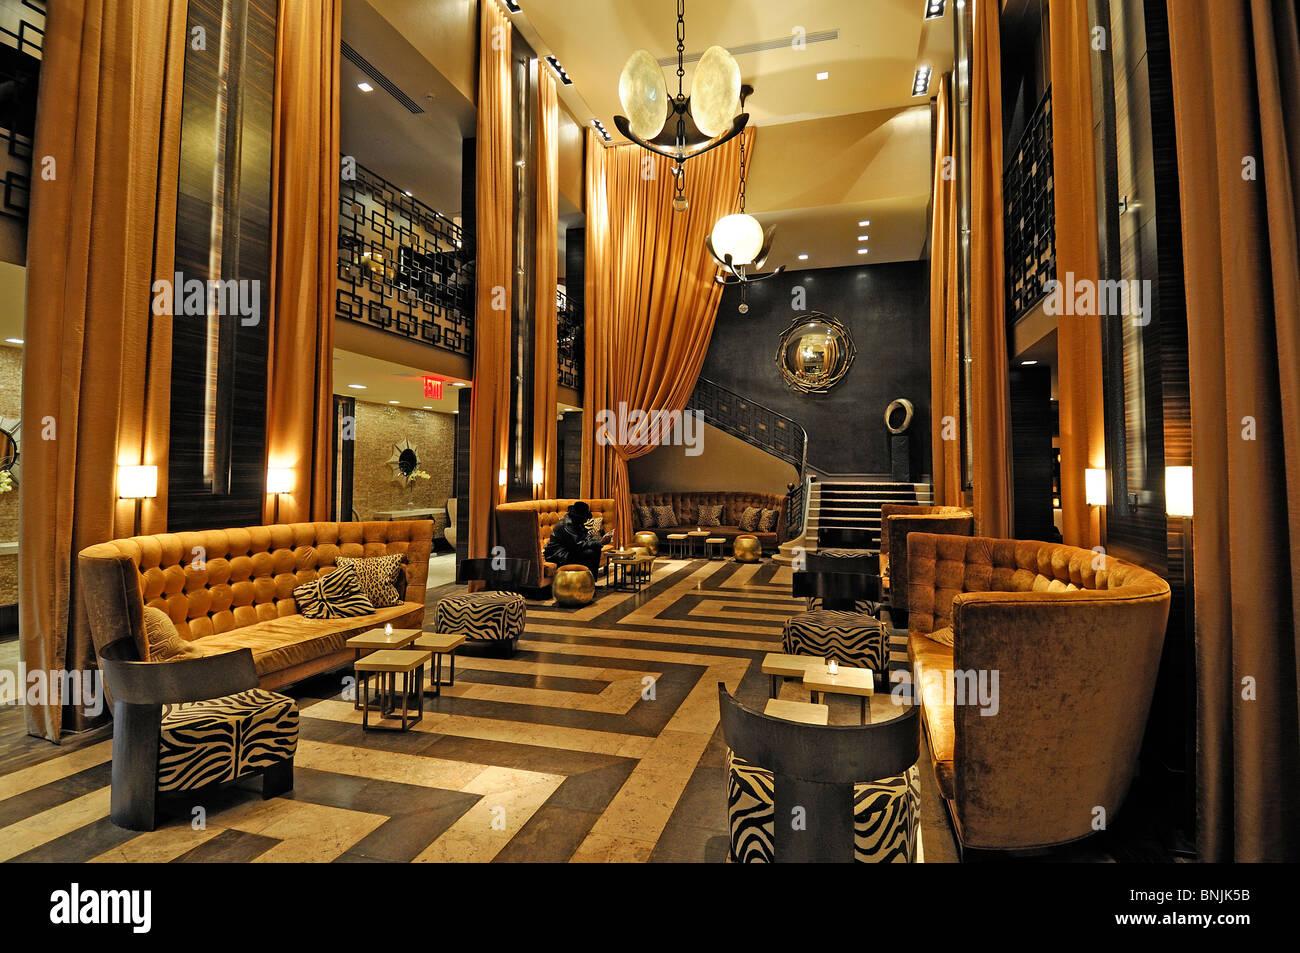 Lobby The Empire Hotel 44 W 63rd Street Upper West Side Manhattan New York USA interior lounge city travel american - Stock Image